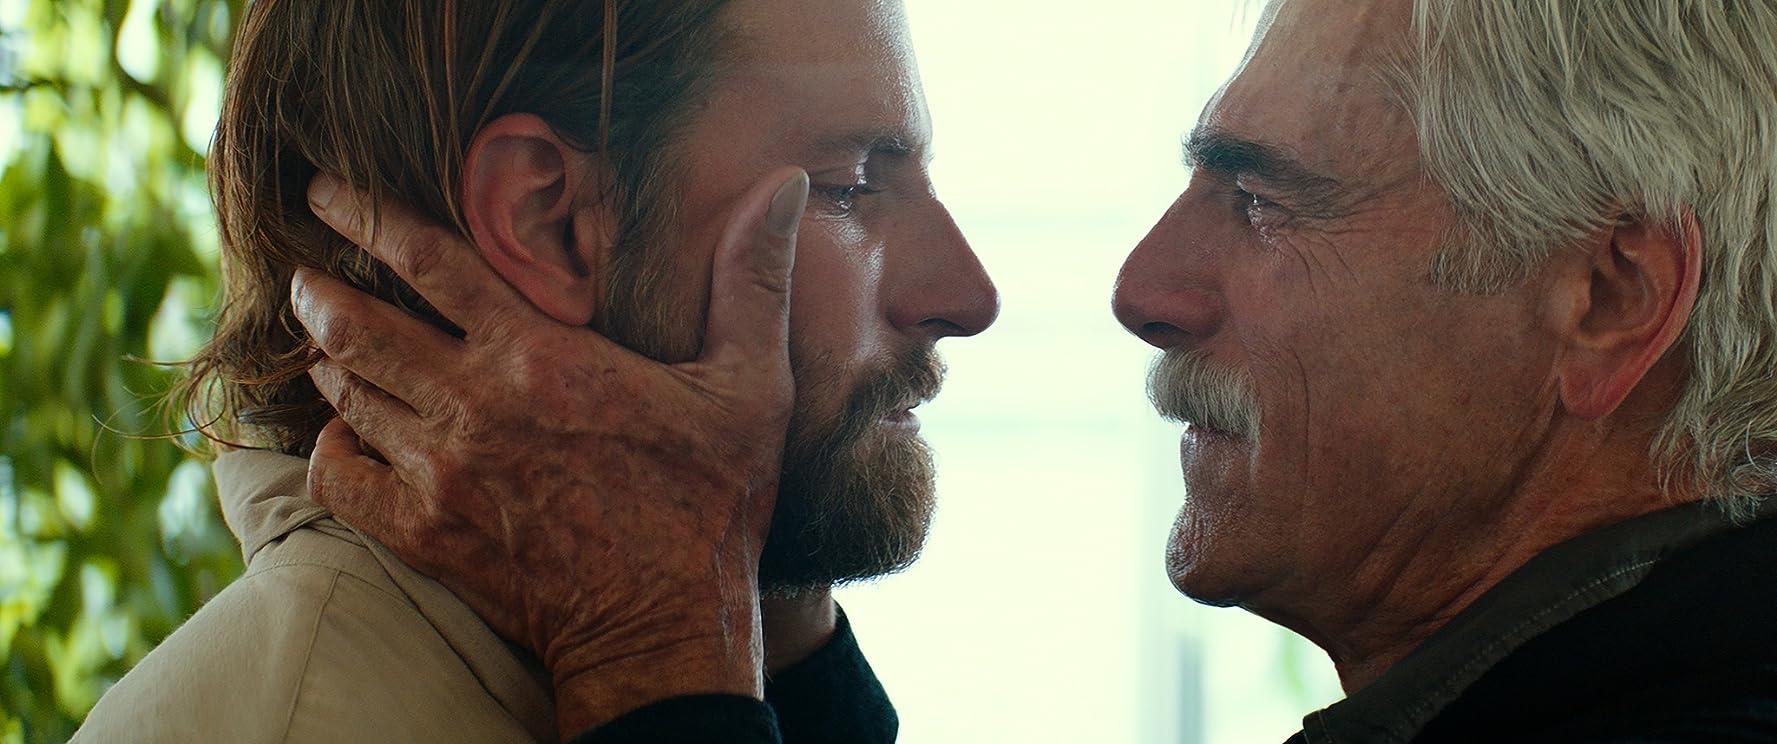 Sam Elliott and Bradley Cooper in A Star Is Born (2018)